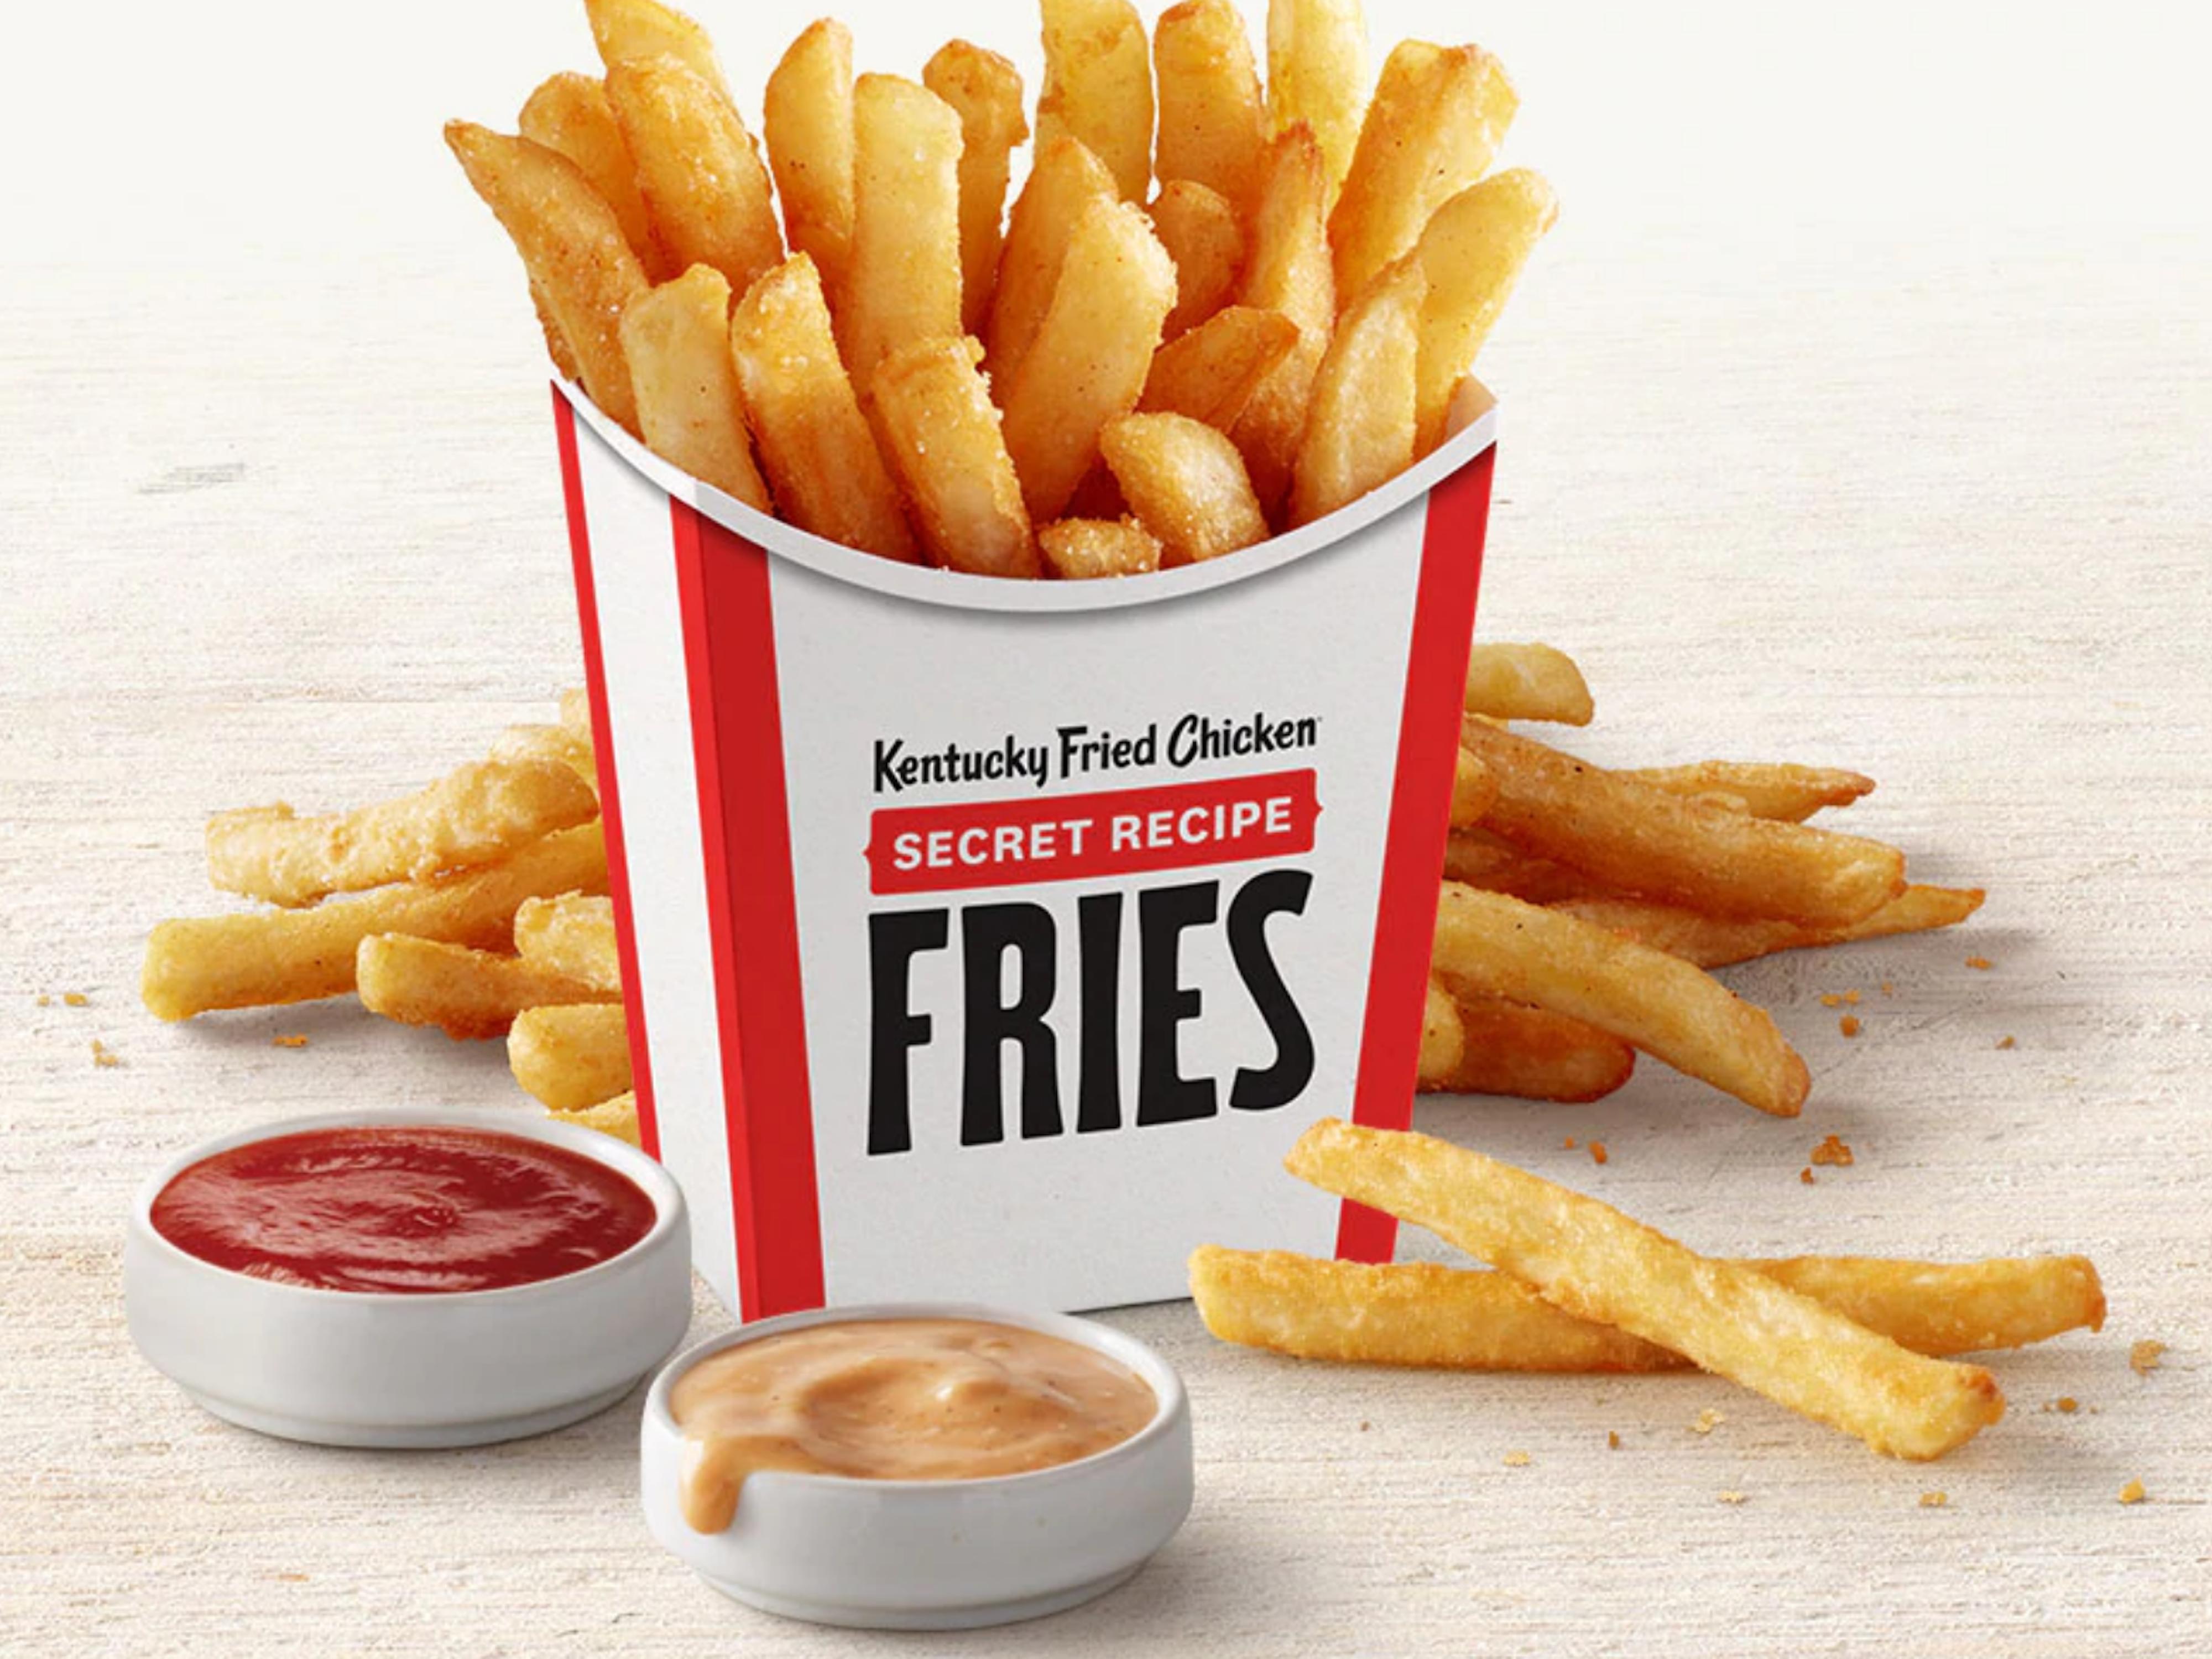 kfc-secret-fries